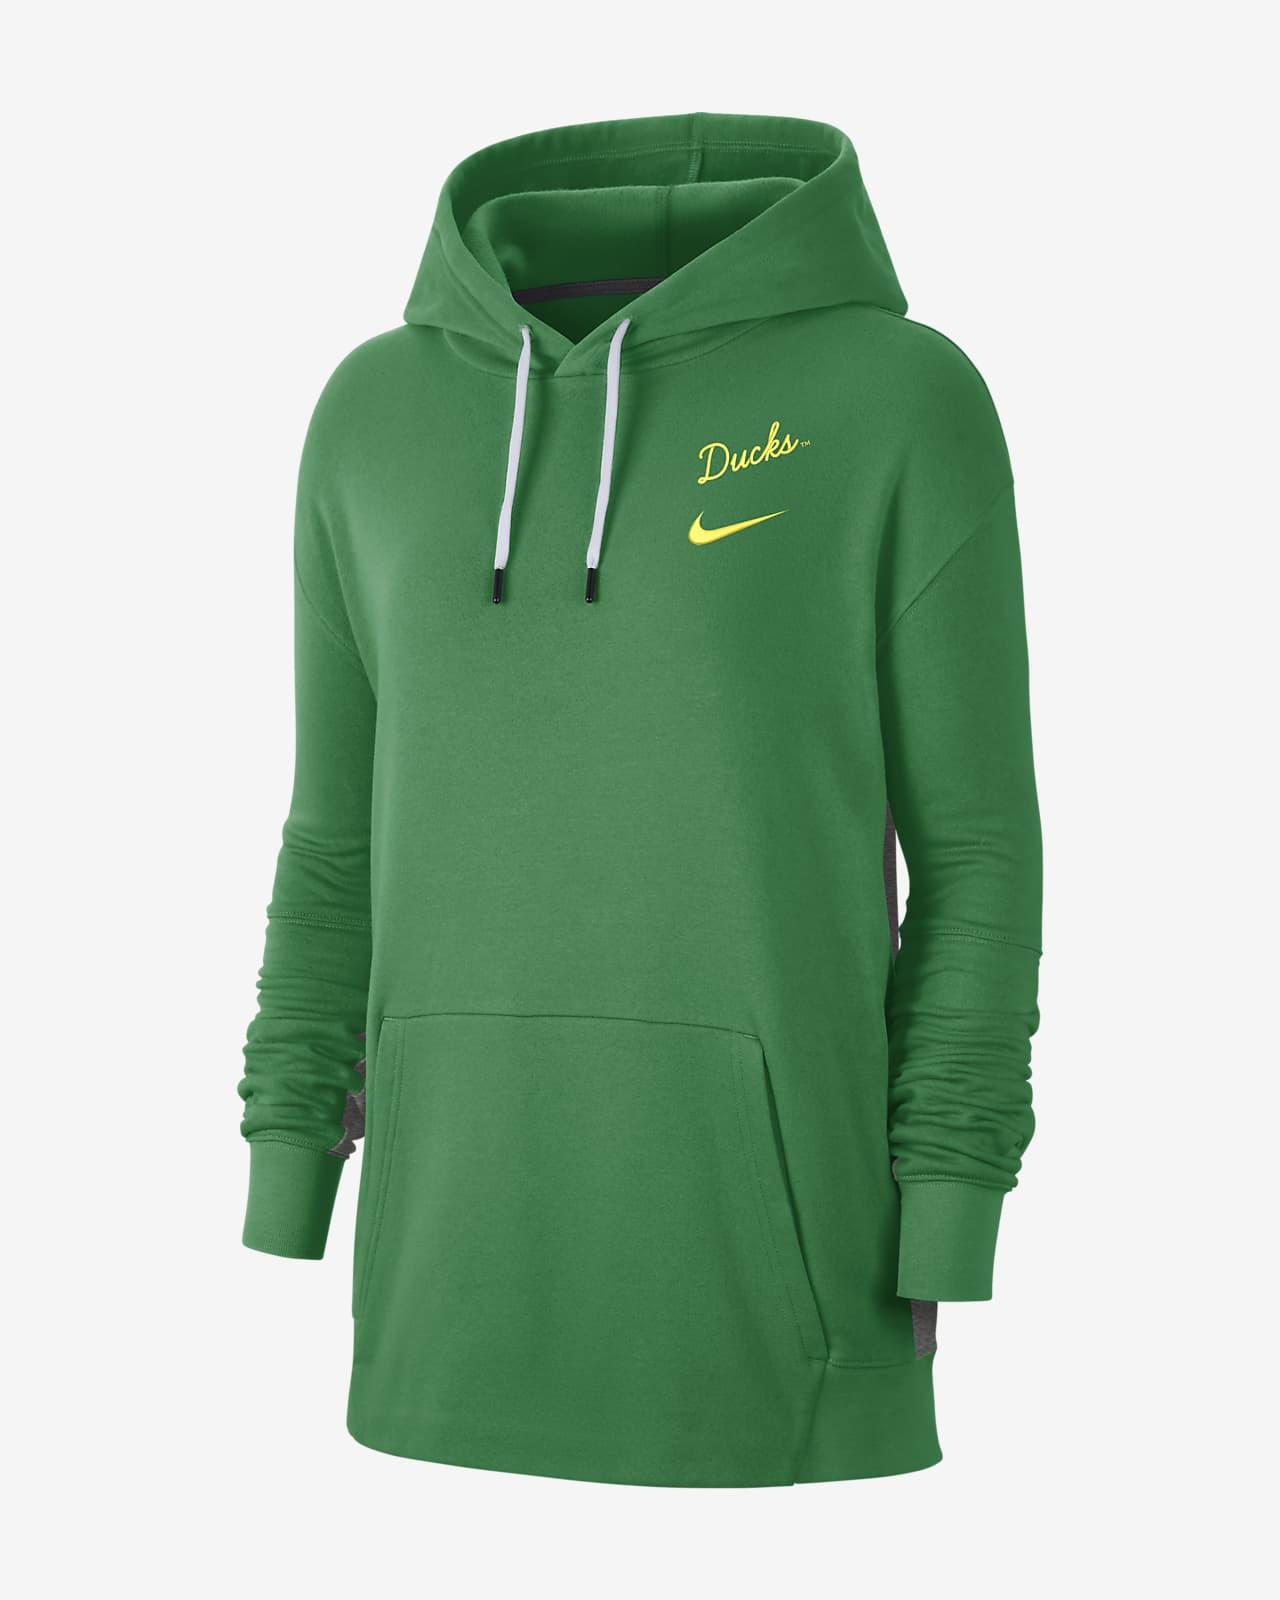 Nike College (Oregon) Women's Fleece Pullover Hoodie